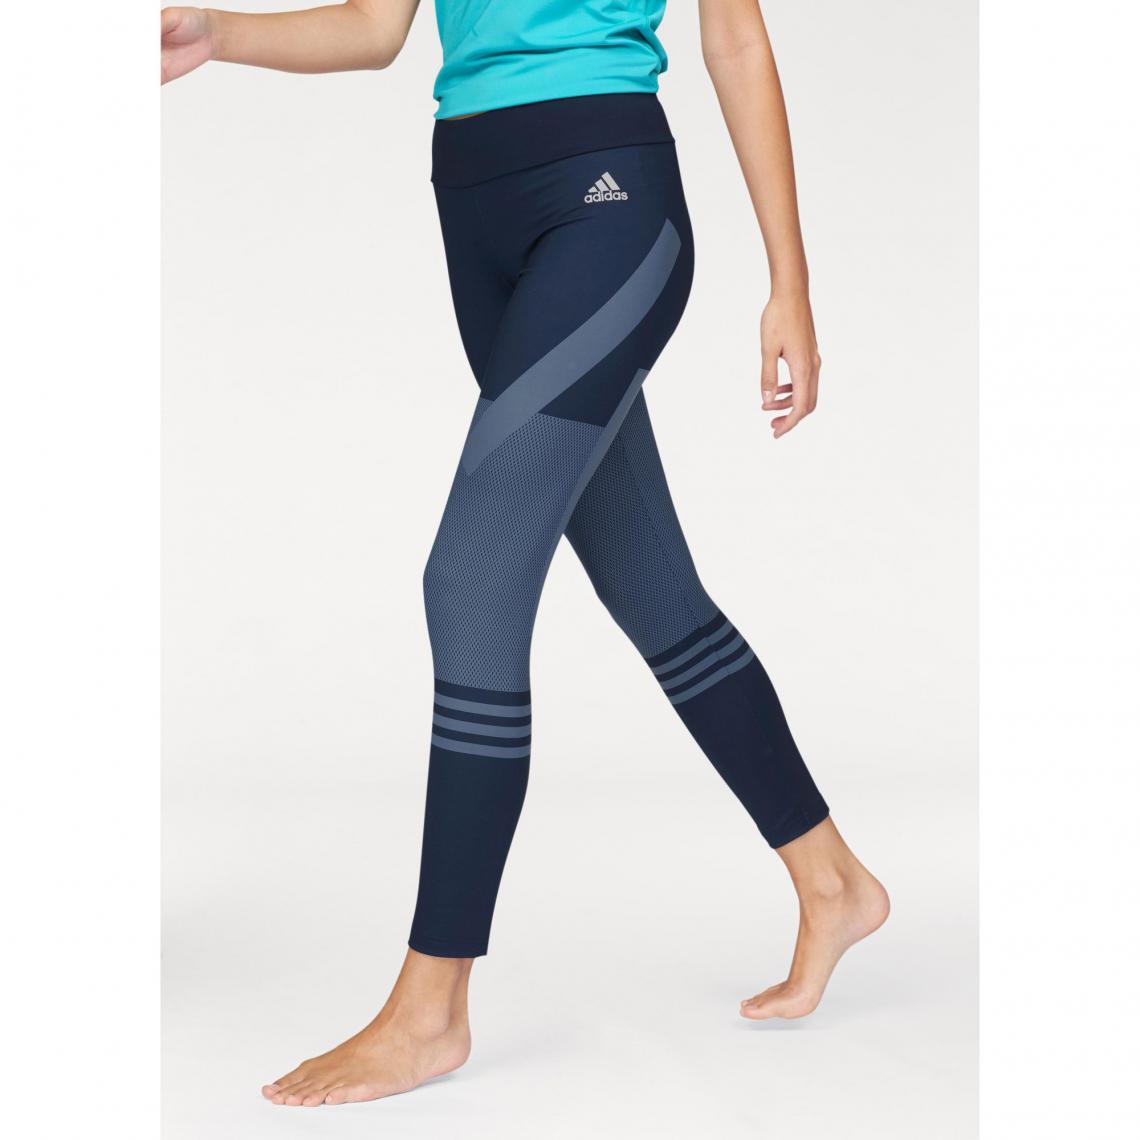 adidas Performance - legging graphique - pour femme - Bleu Adidas  Performance Femme 7c7ad43da3e